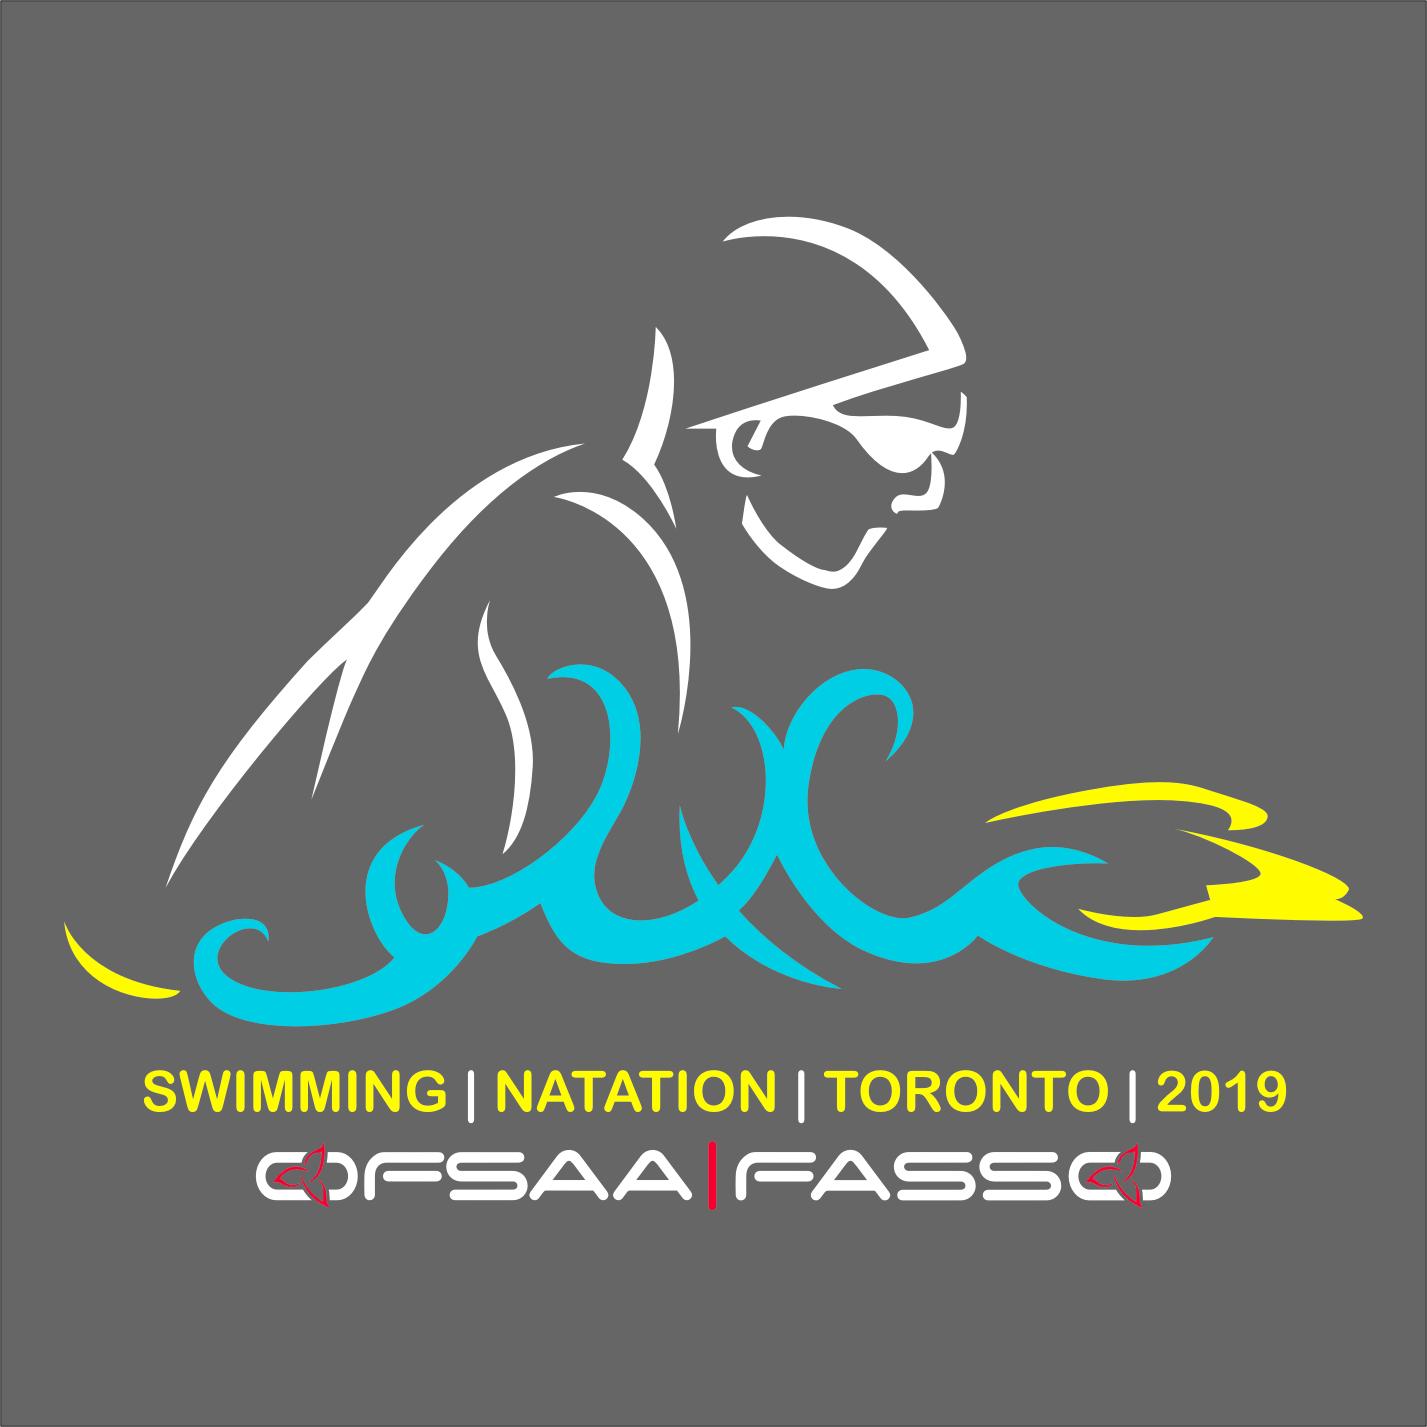 2019 Swim logo grey.jpg